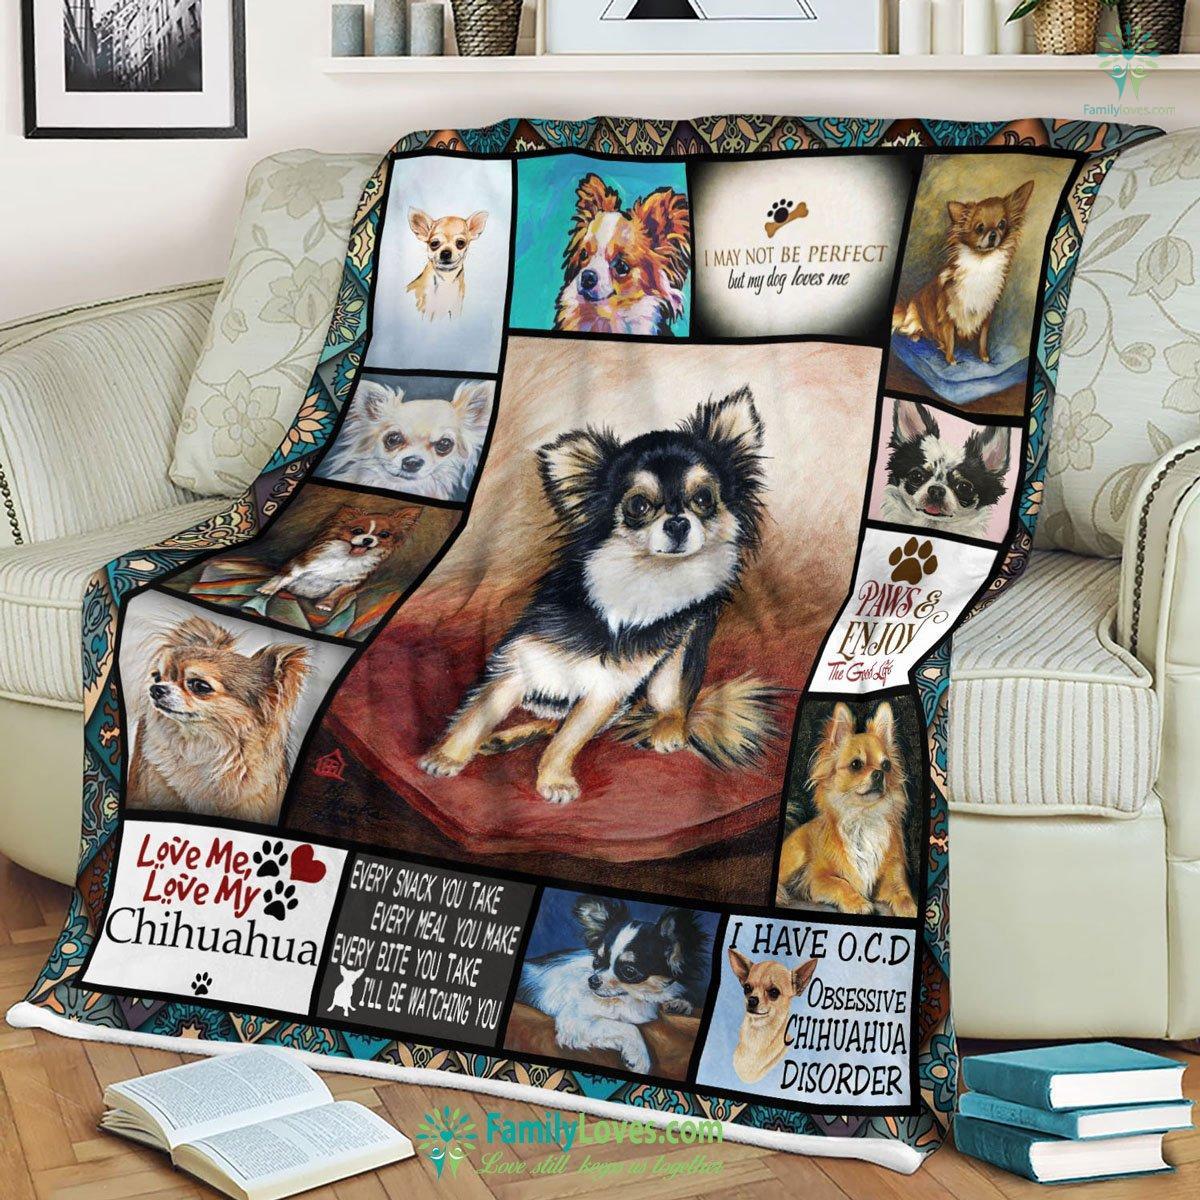 Love Me Love My Chihuahua Blanket 3 Familyloves.com